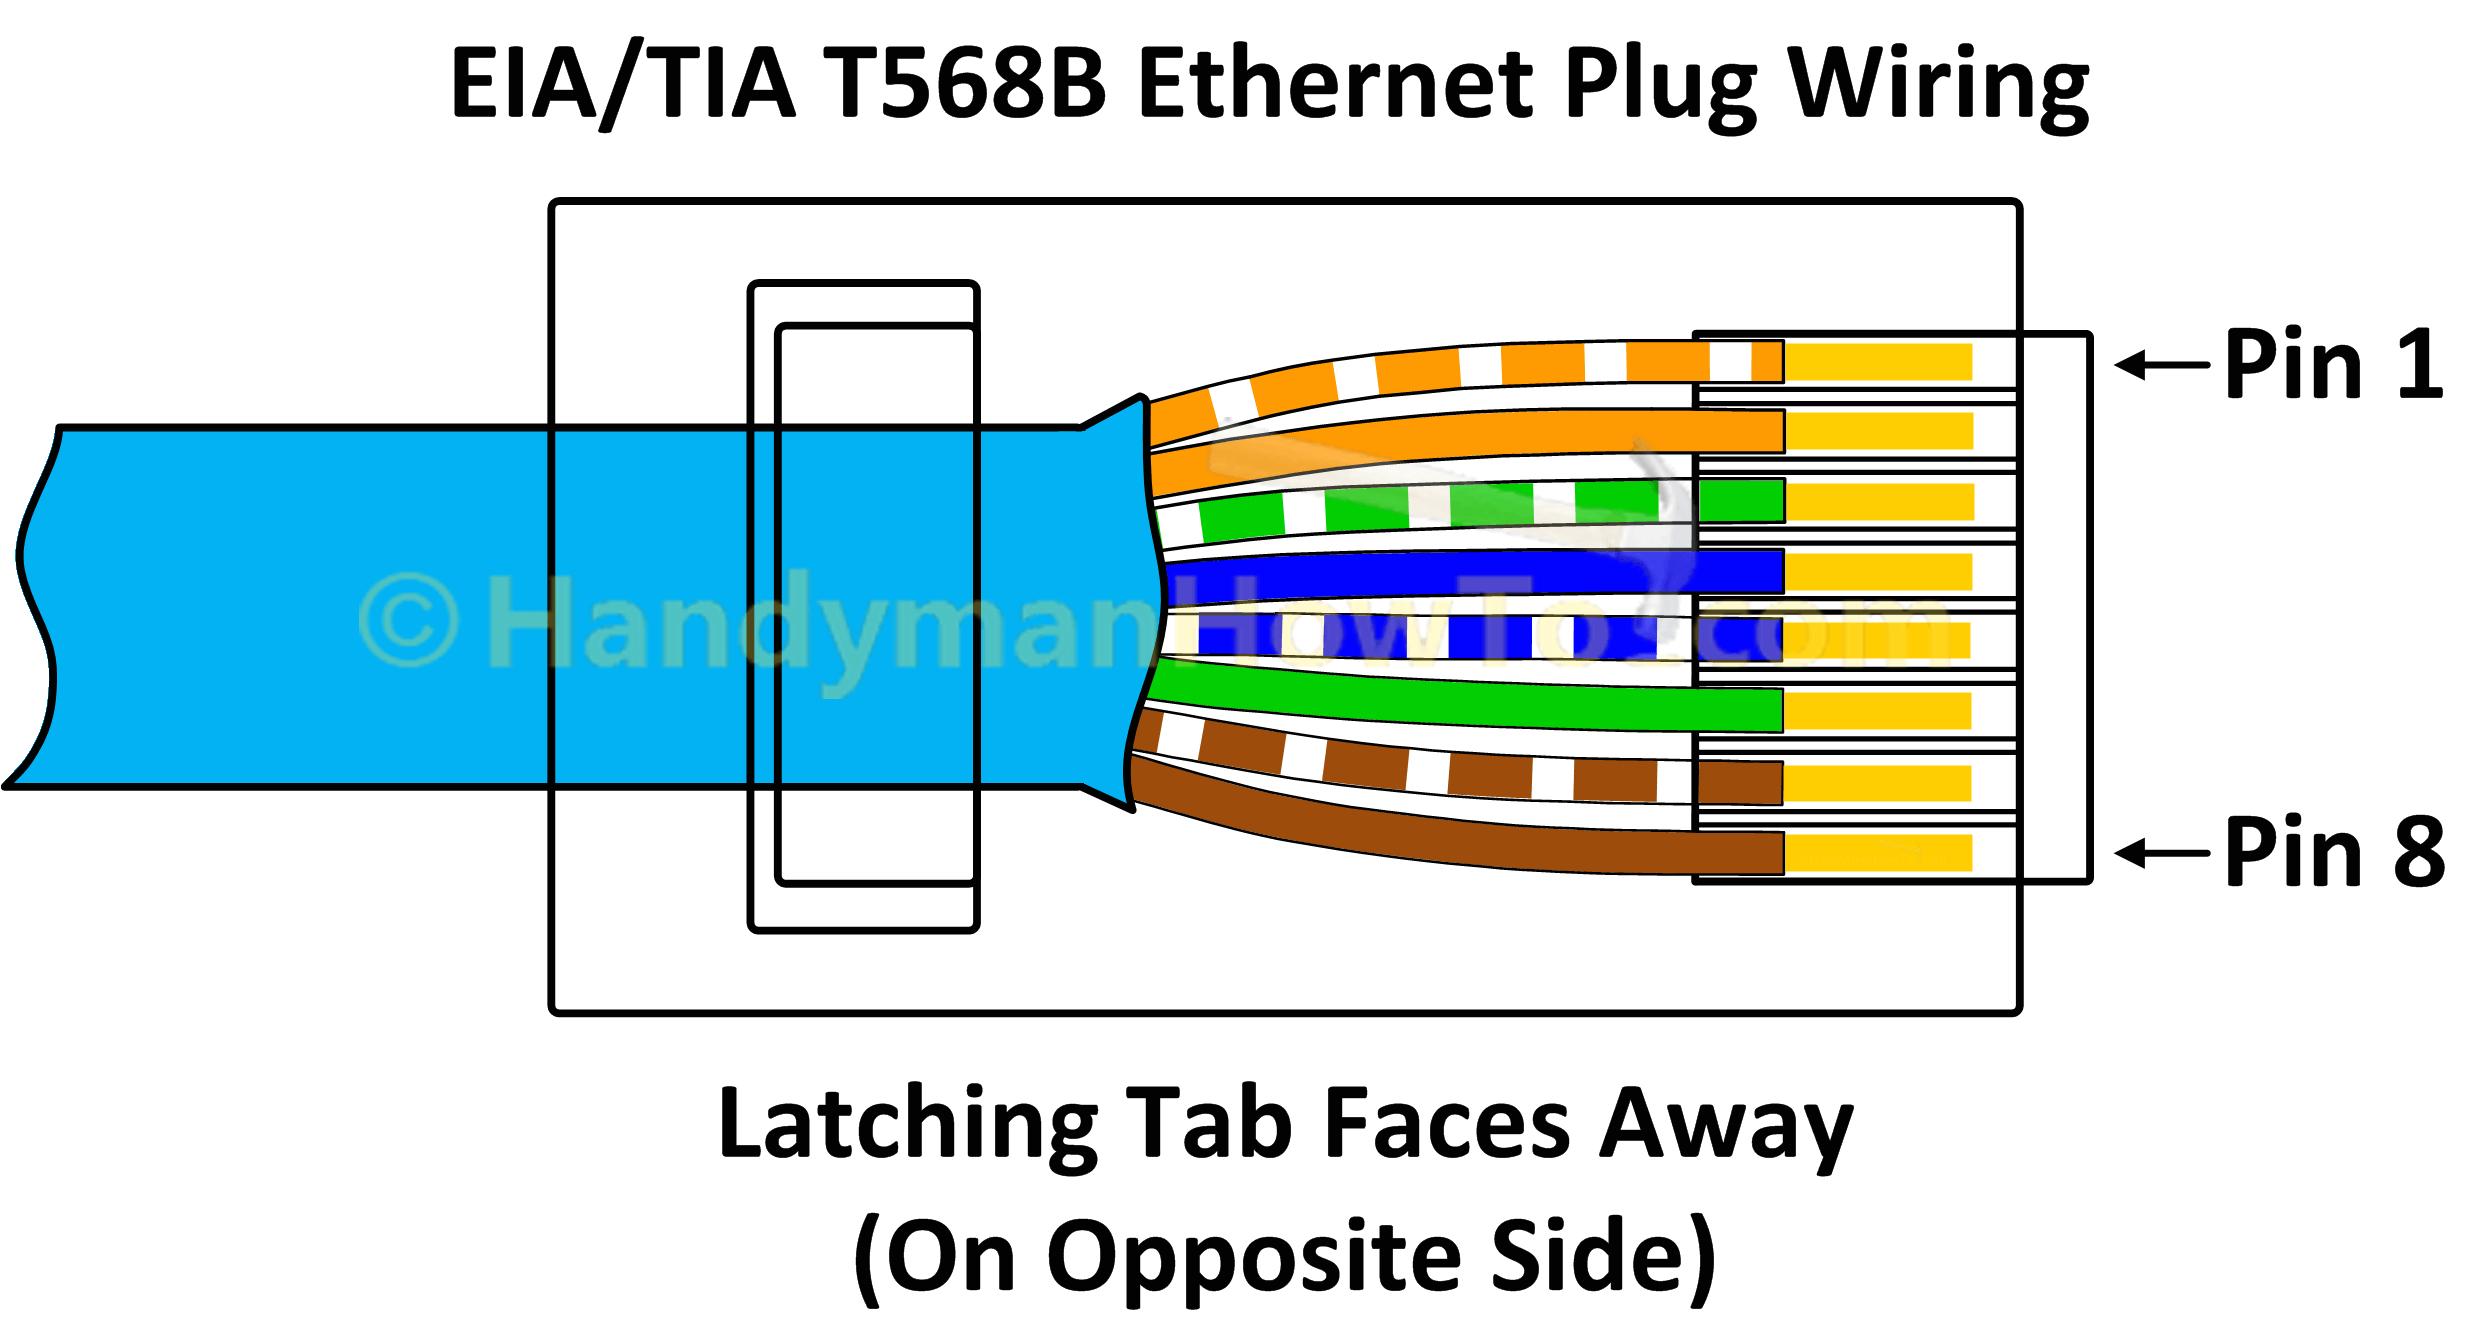 rj45 wiring diagram pdf wiring diagram go rj45 connection diagram pdf rj45 diagram pdf